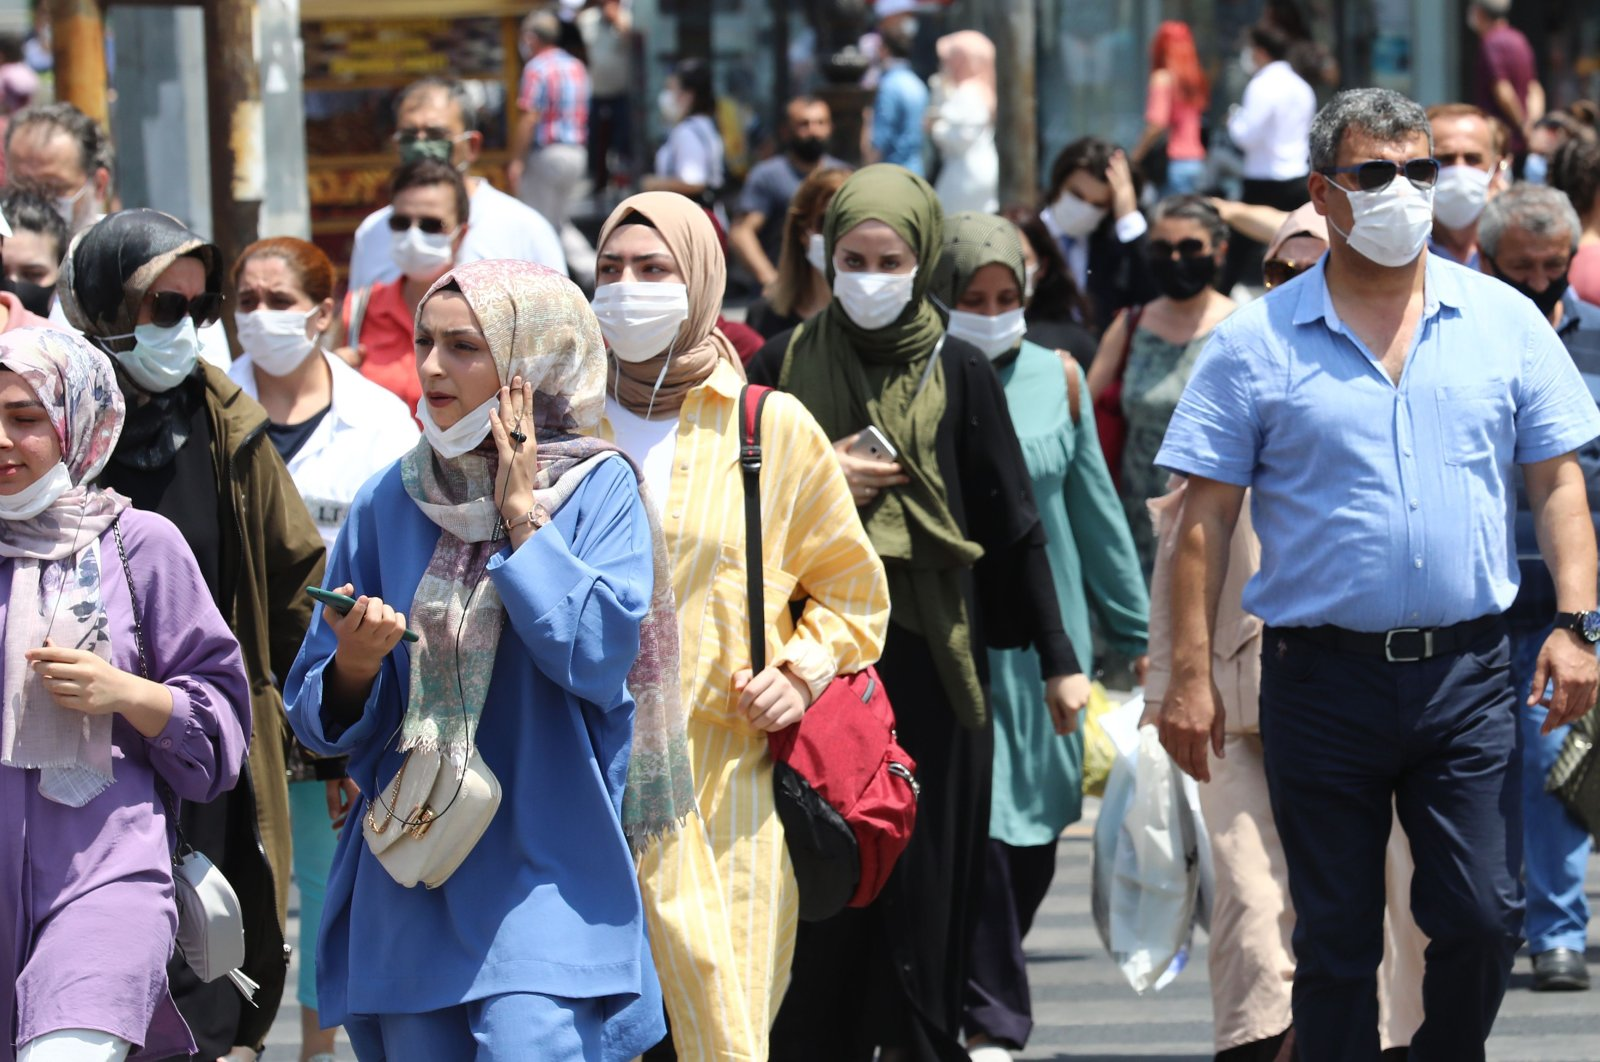 People wearing face masks walk downtown in Ankara, July 7, 2020. (AFP Photo)